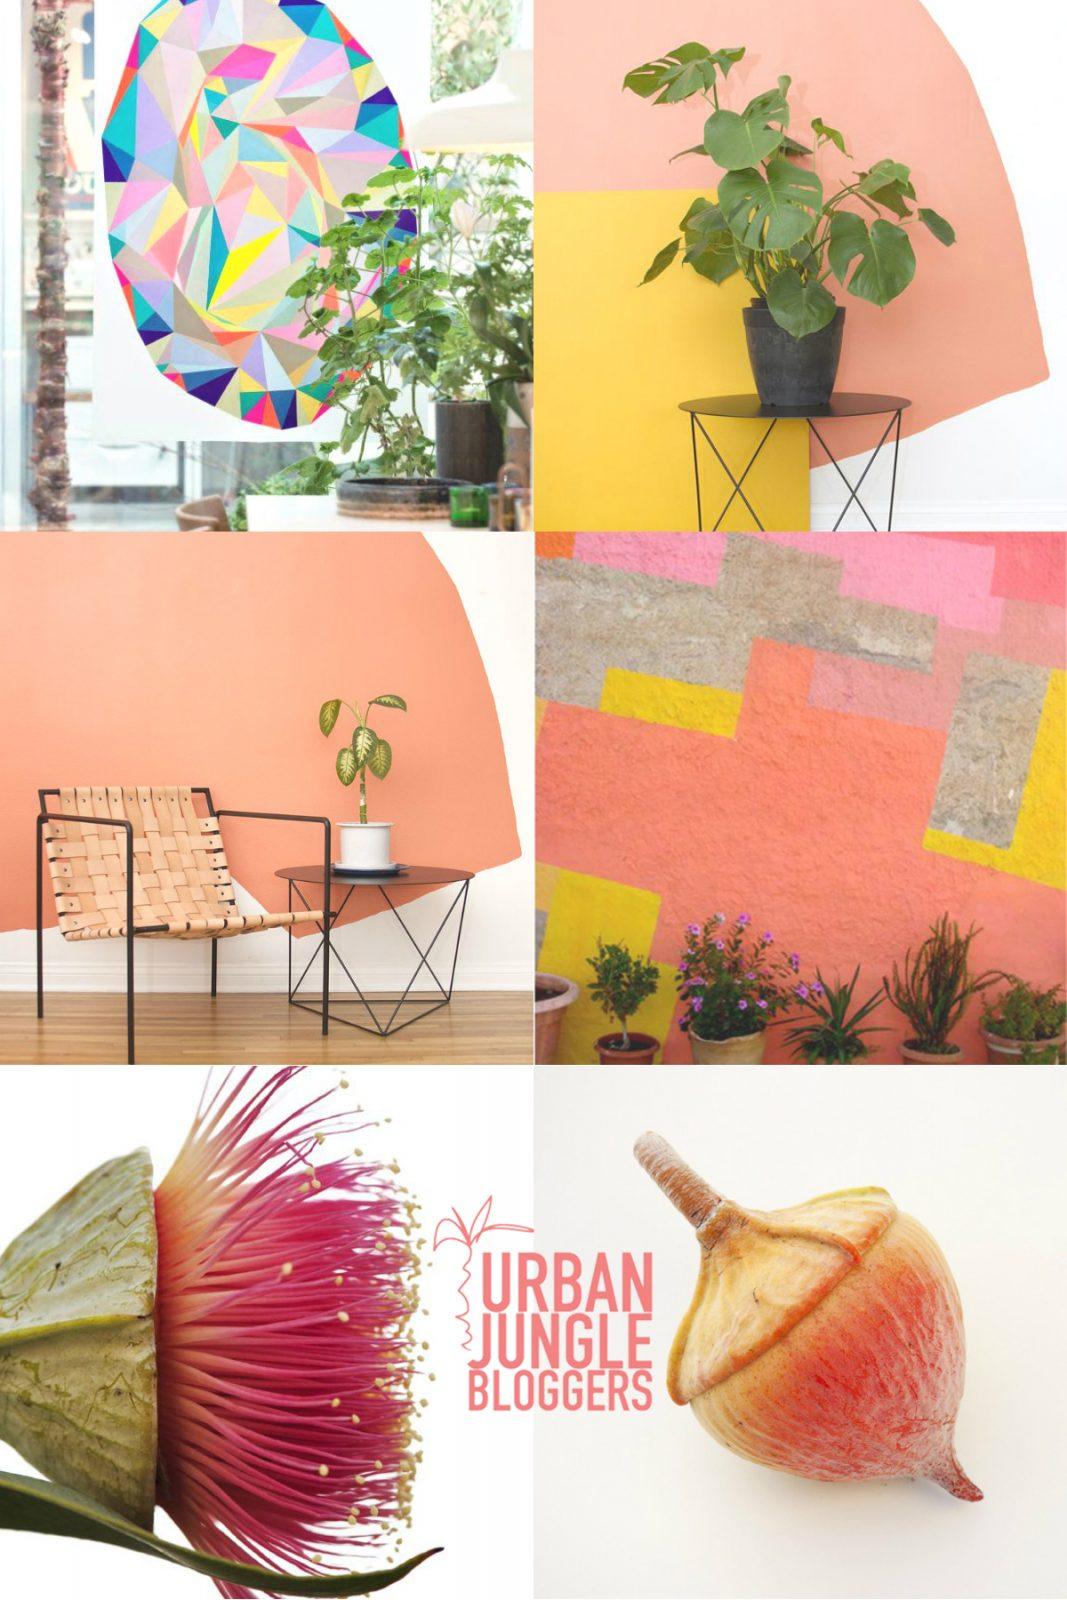 Urban Jungle Bloggers plant color pop